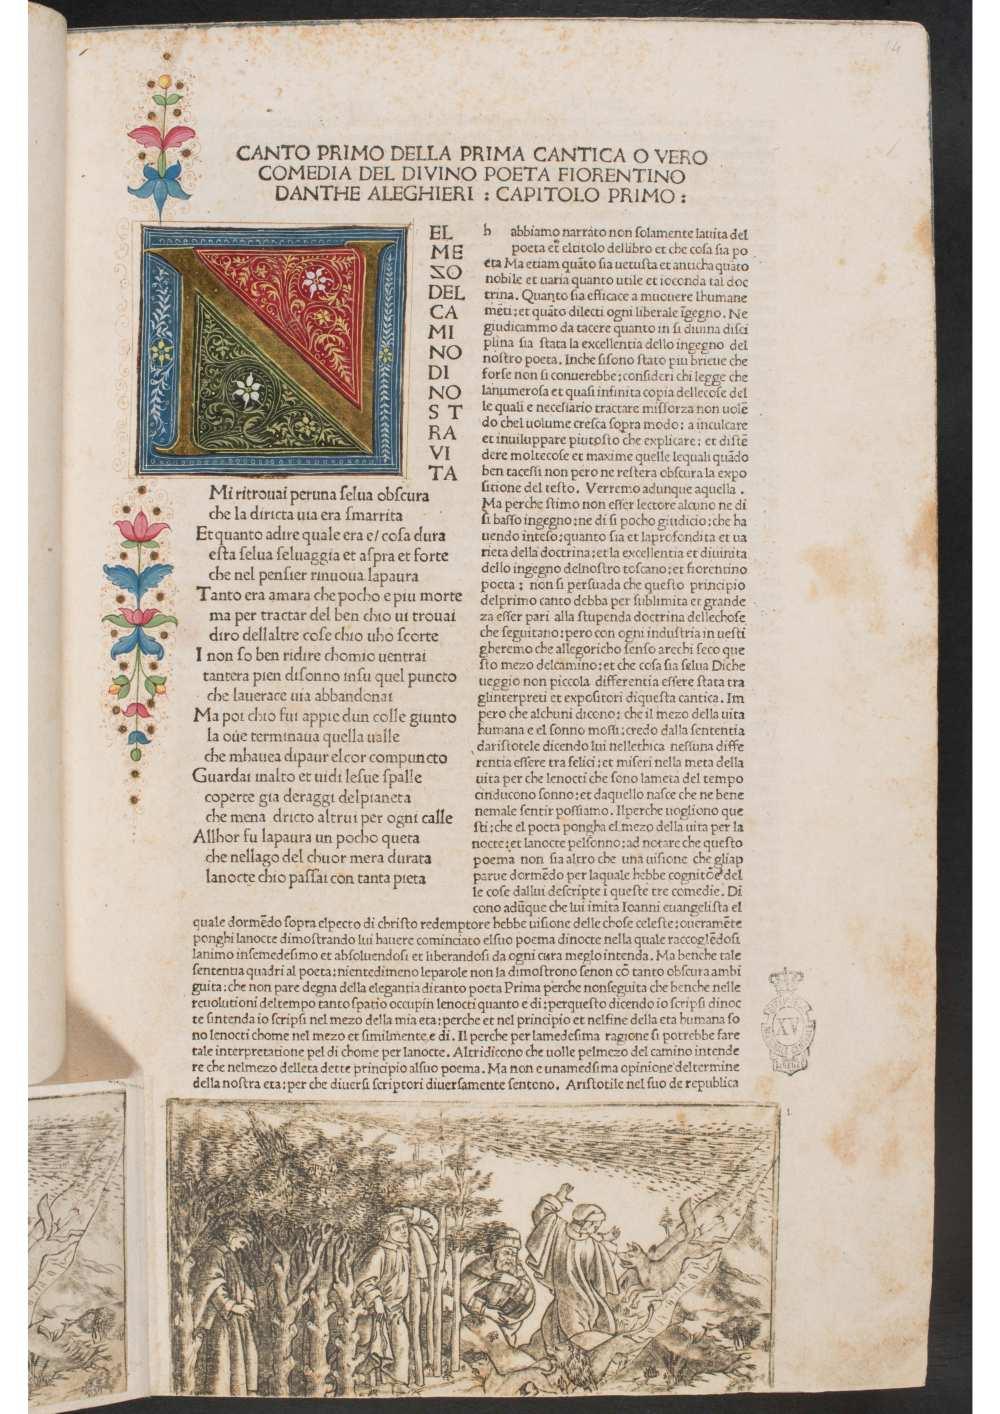 Firenze, Biblioteca Nazionale Centrale: Banco Rari 12. A kép forrása: Internet Archive https://archive.org/details/b.-r.-12_202101/page/n34/mode/1up